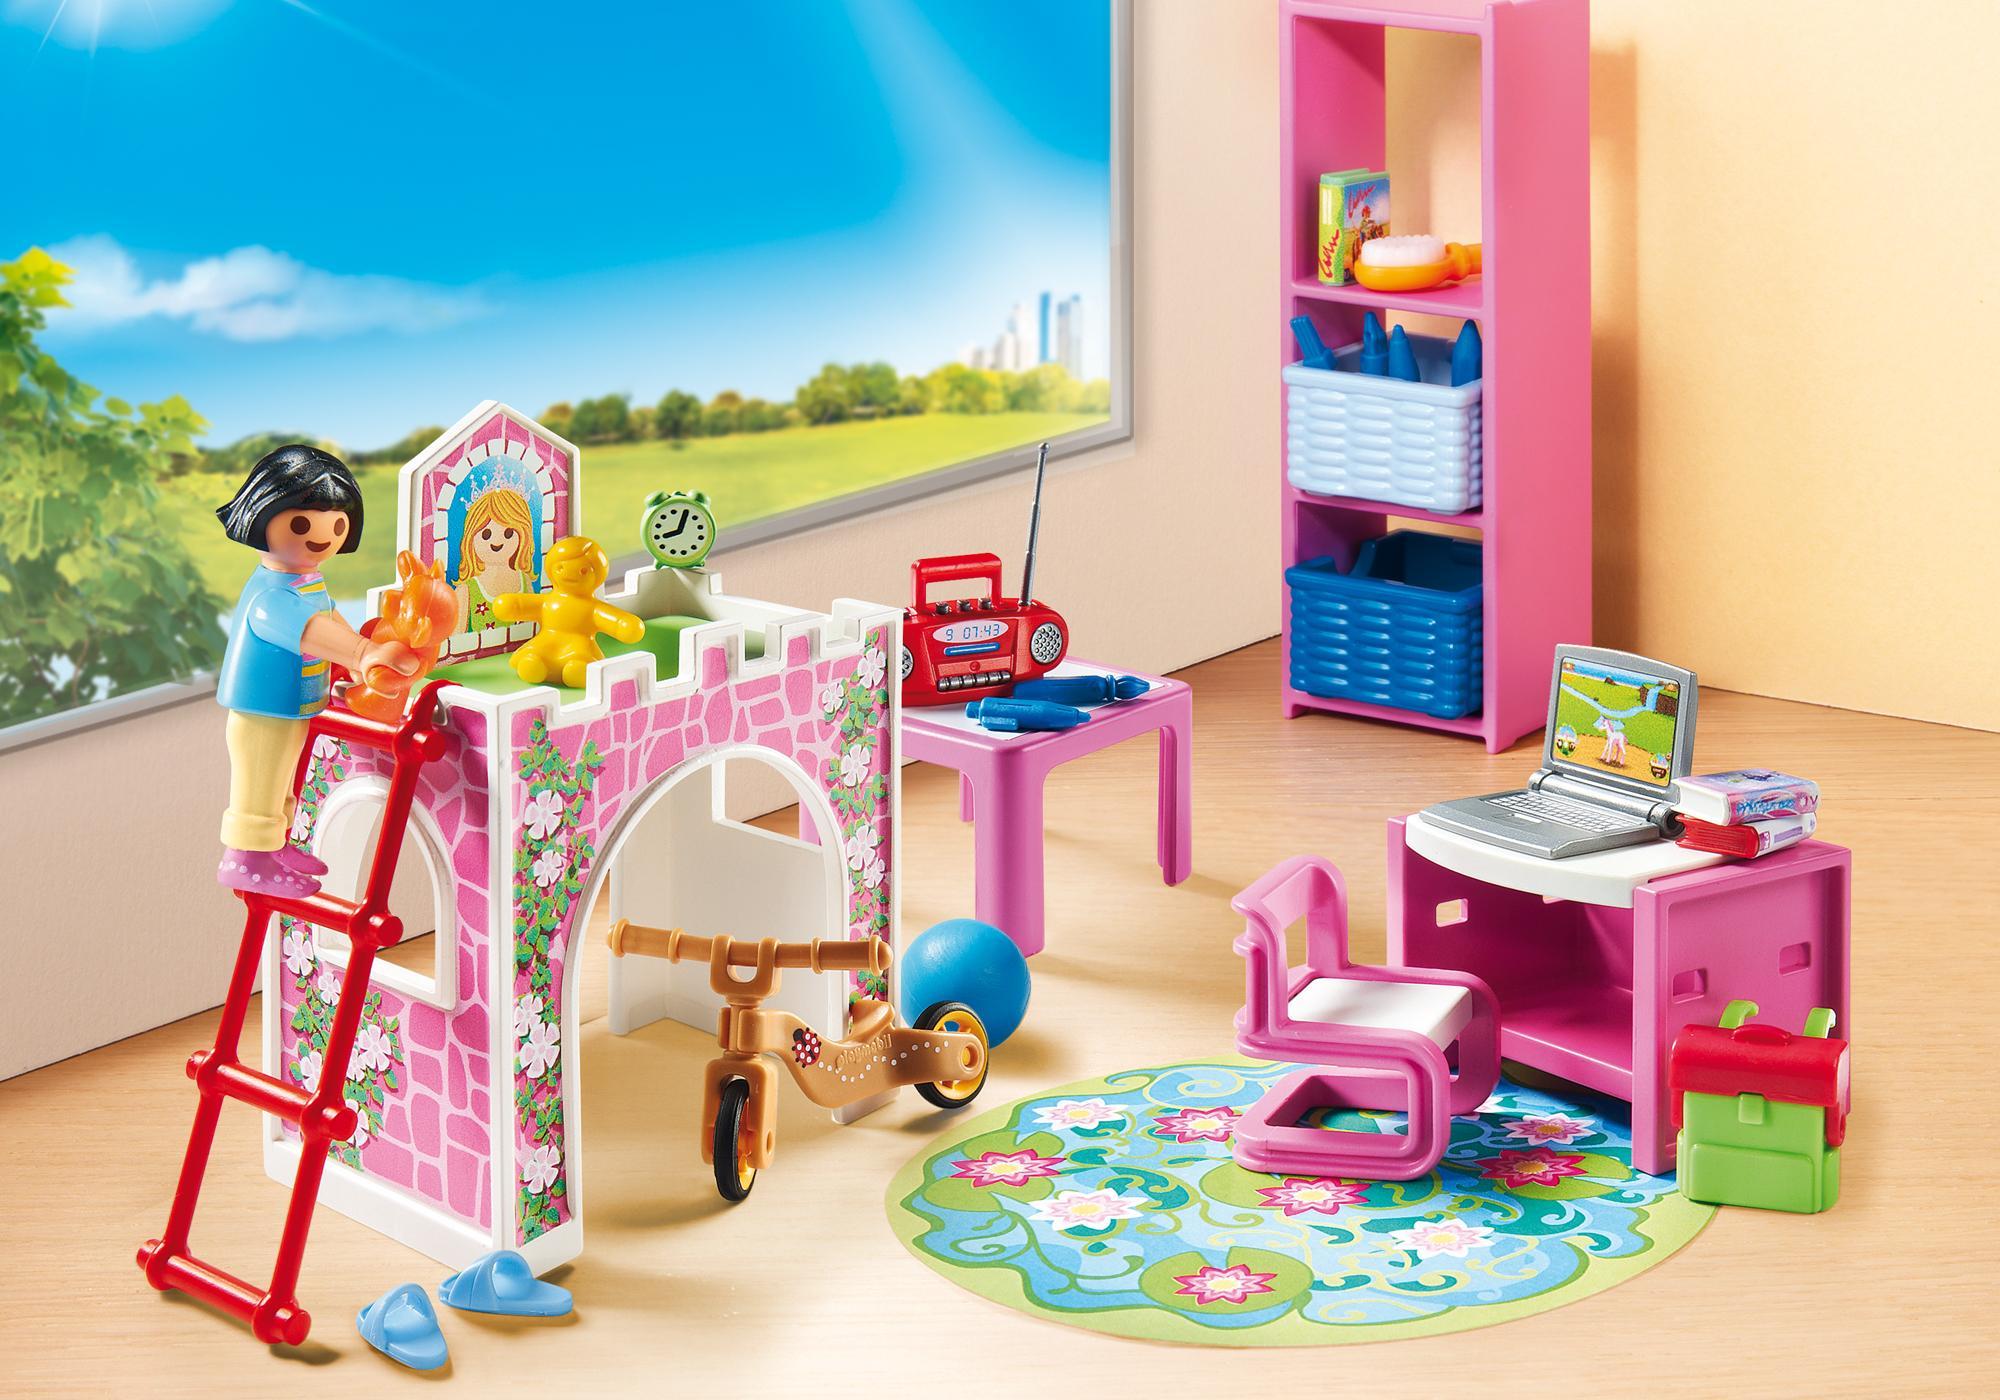 http://media.playmobil.com/i/playmobil/9270_product_detail/Children's Room